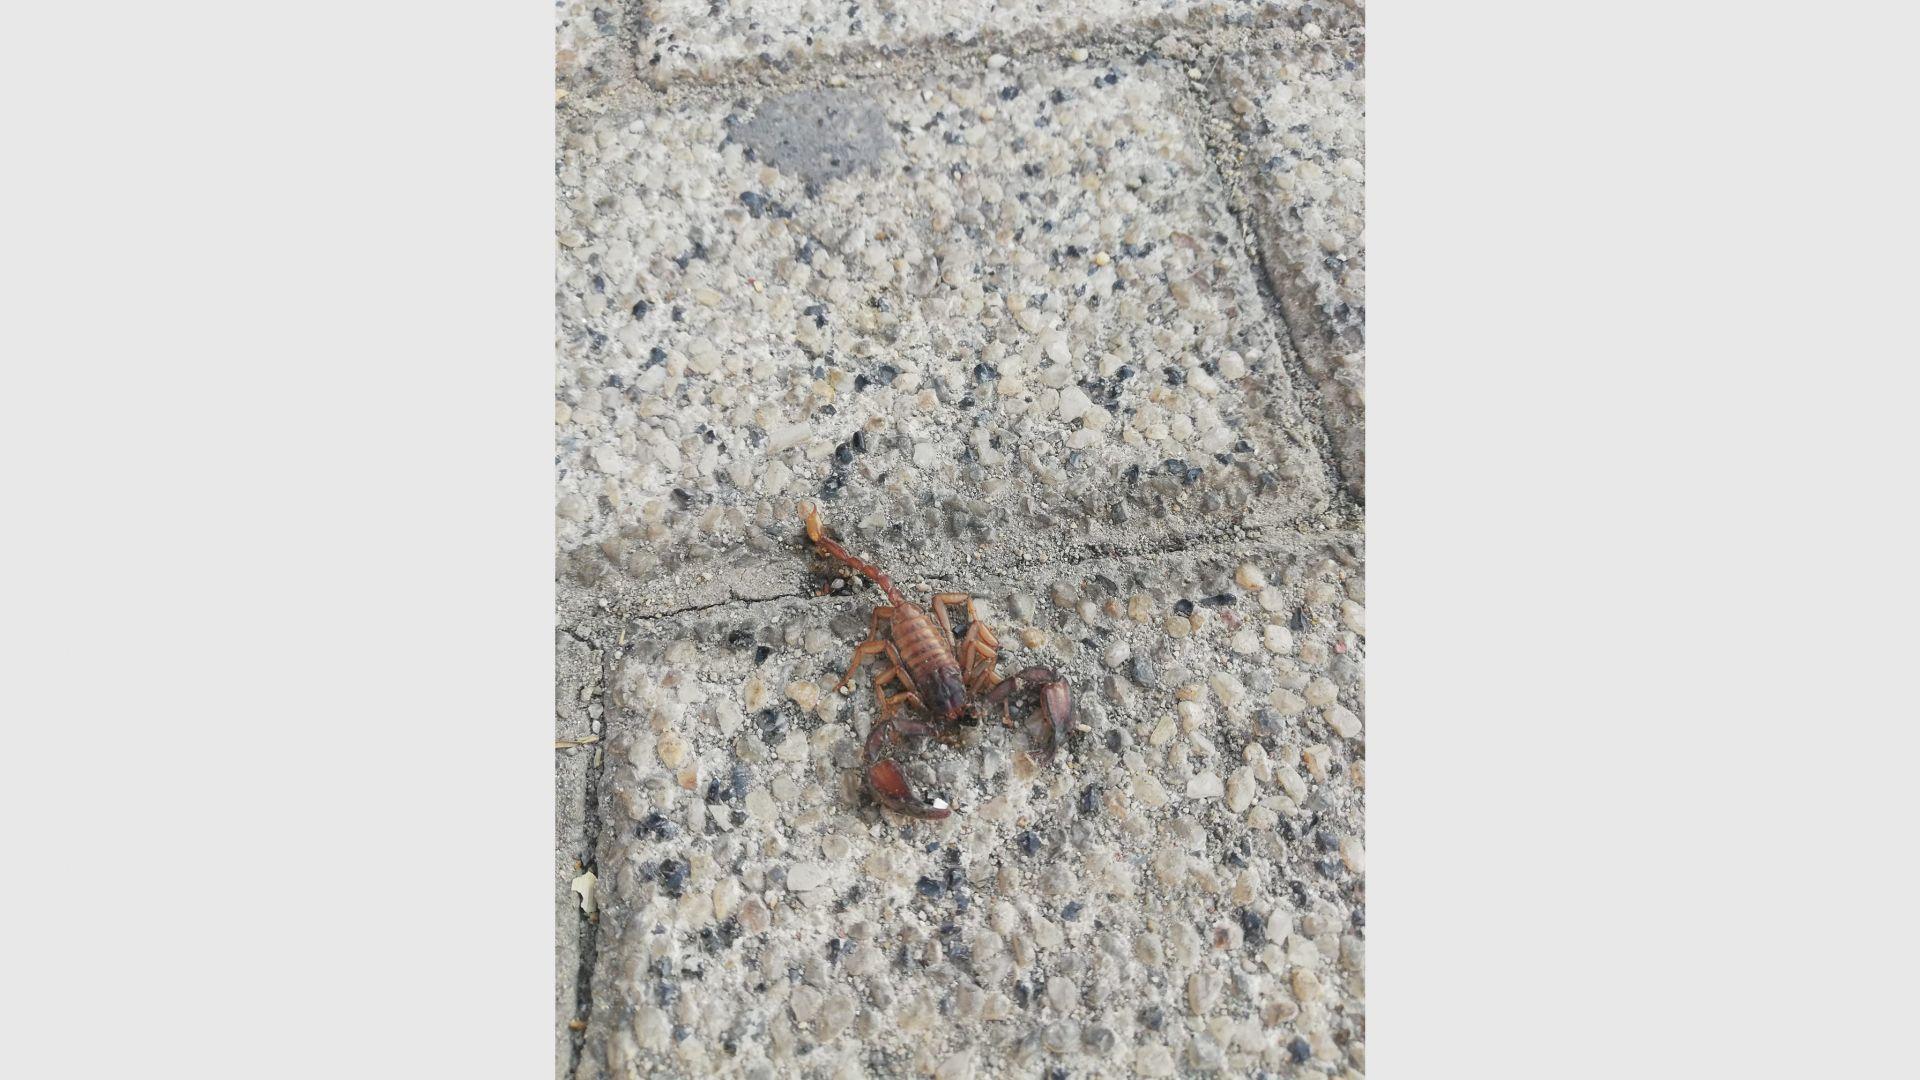 Нашествие от скорпиони в Пловдив